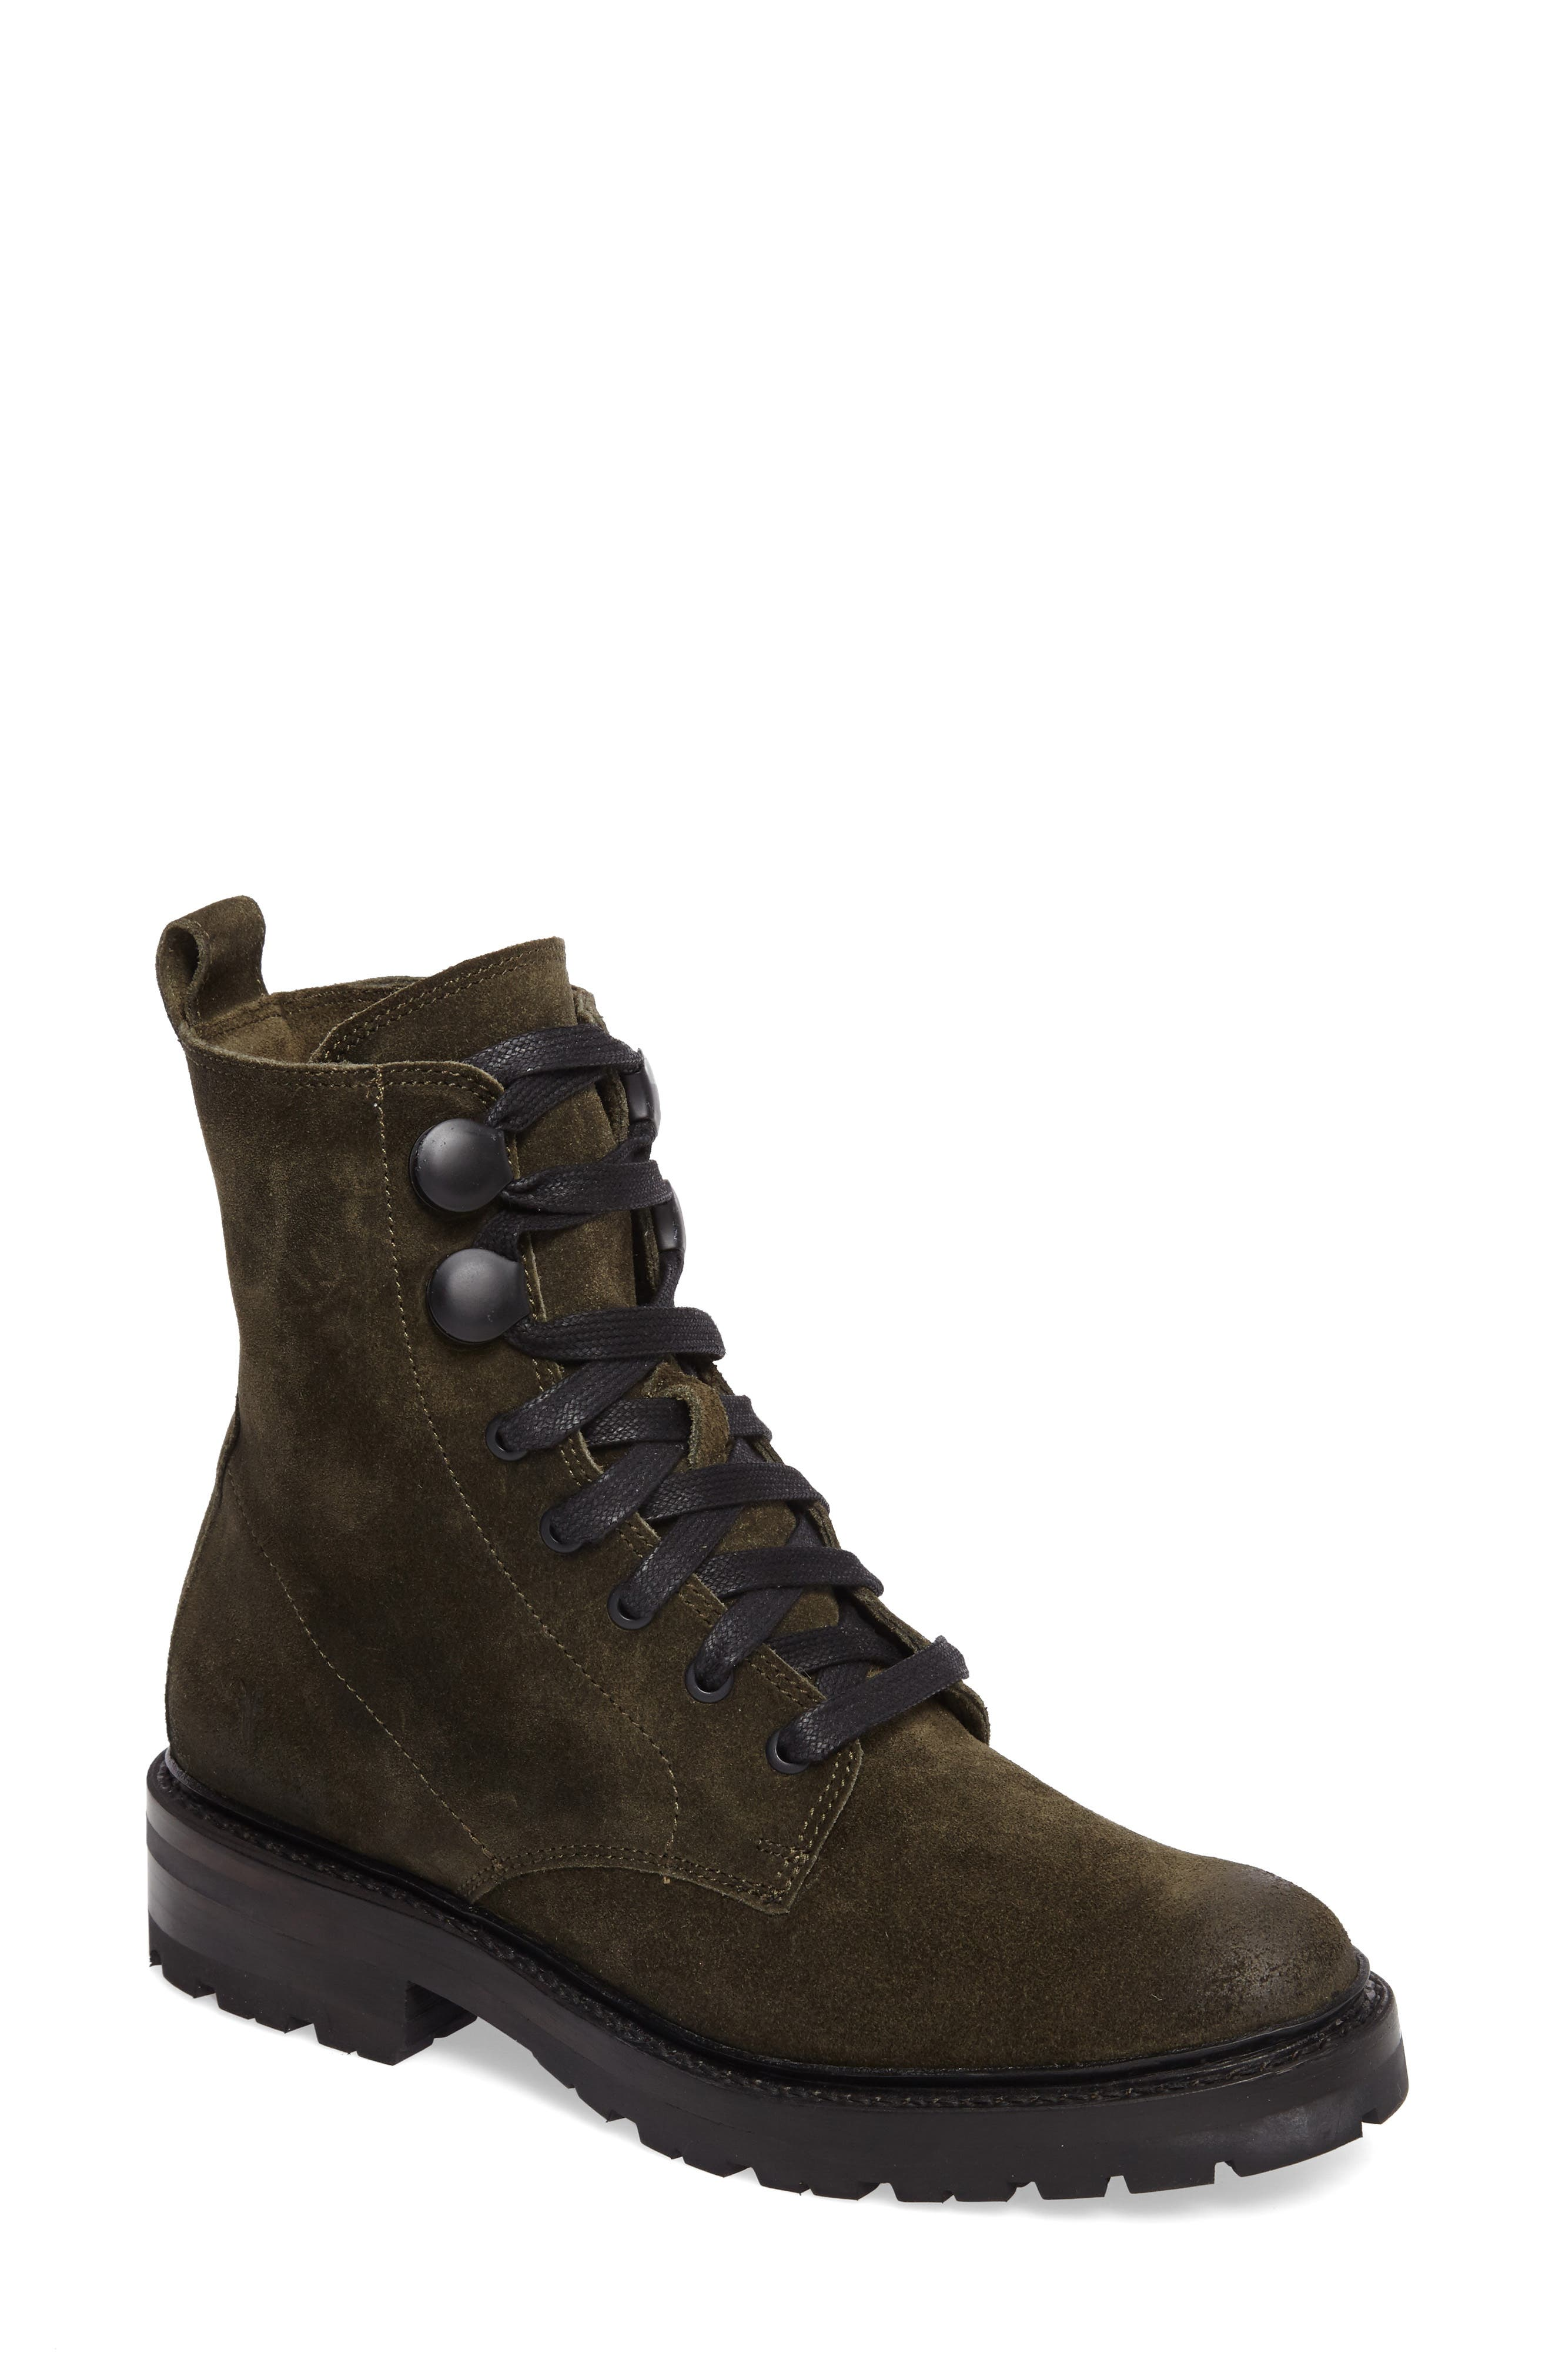 Julie Hook Combat Boot,                         Main,                         color, Forest